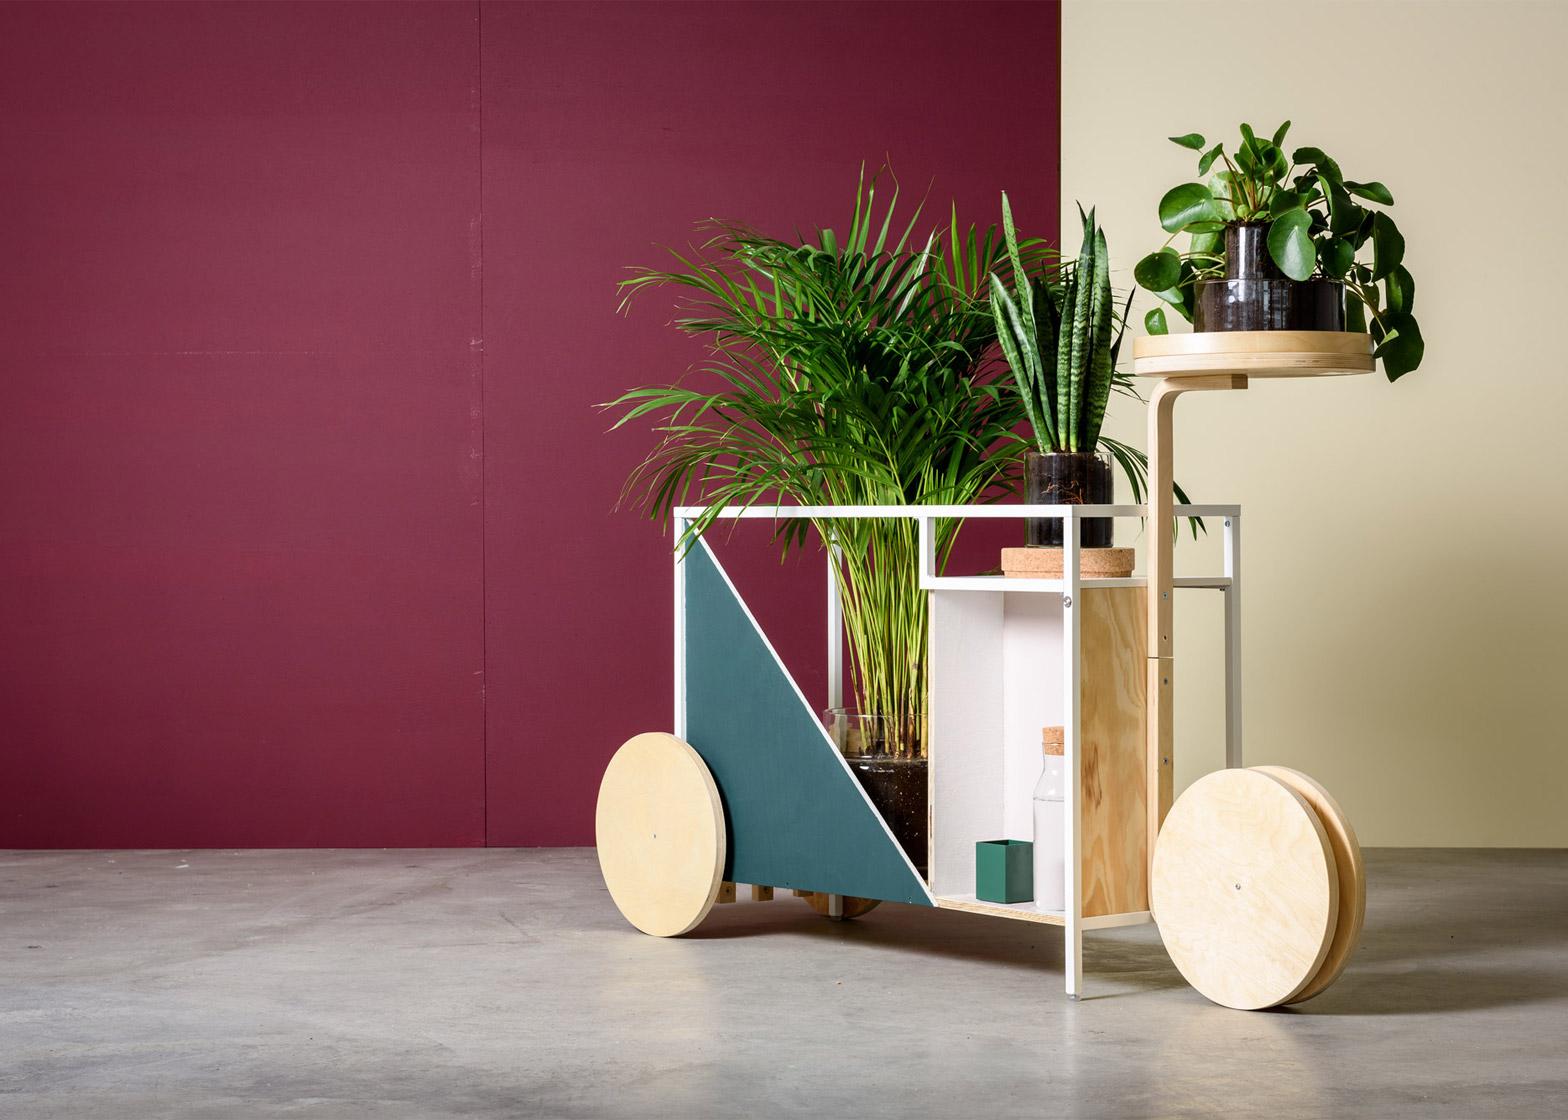 Ikea-Space-10-Innovation-Lab_Alastair-Philip-Wiper_dezeen_1568_0